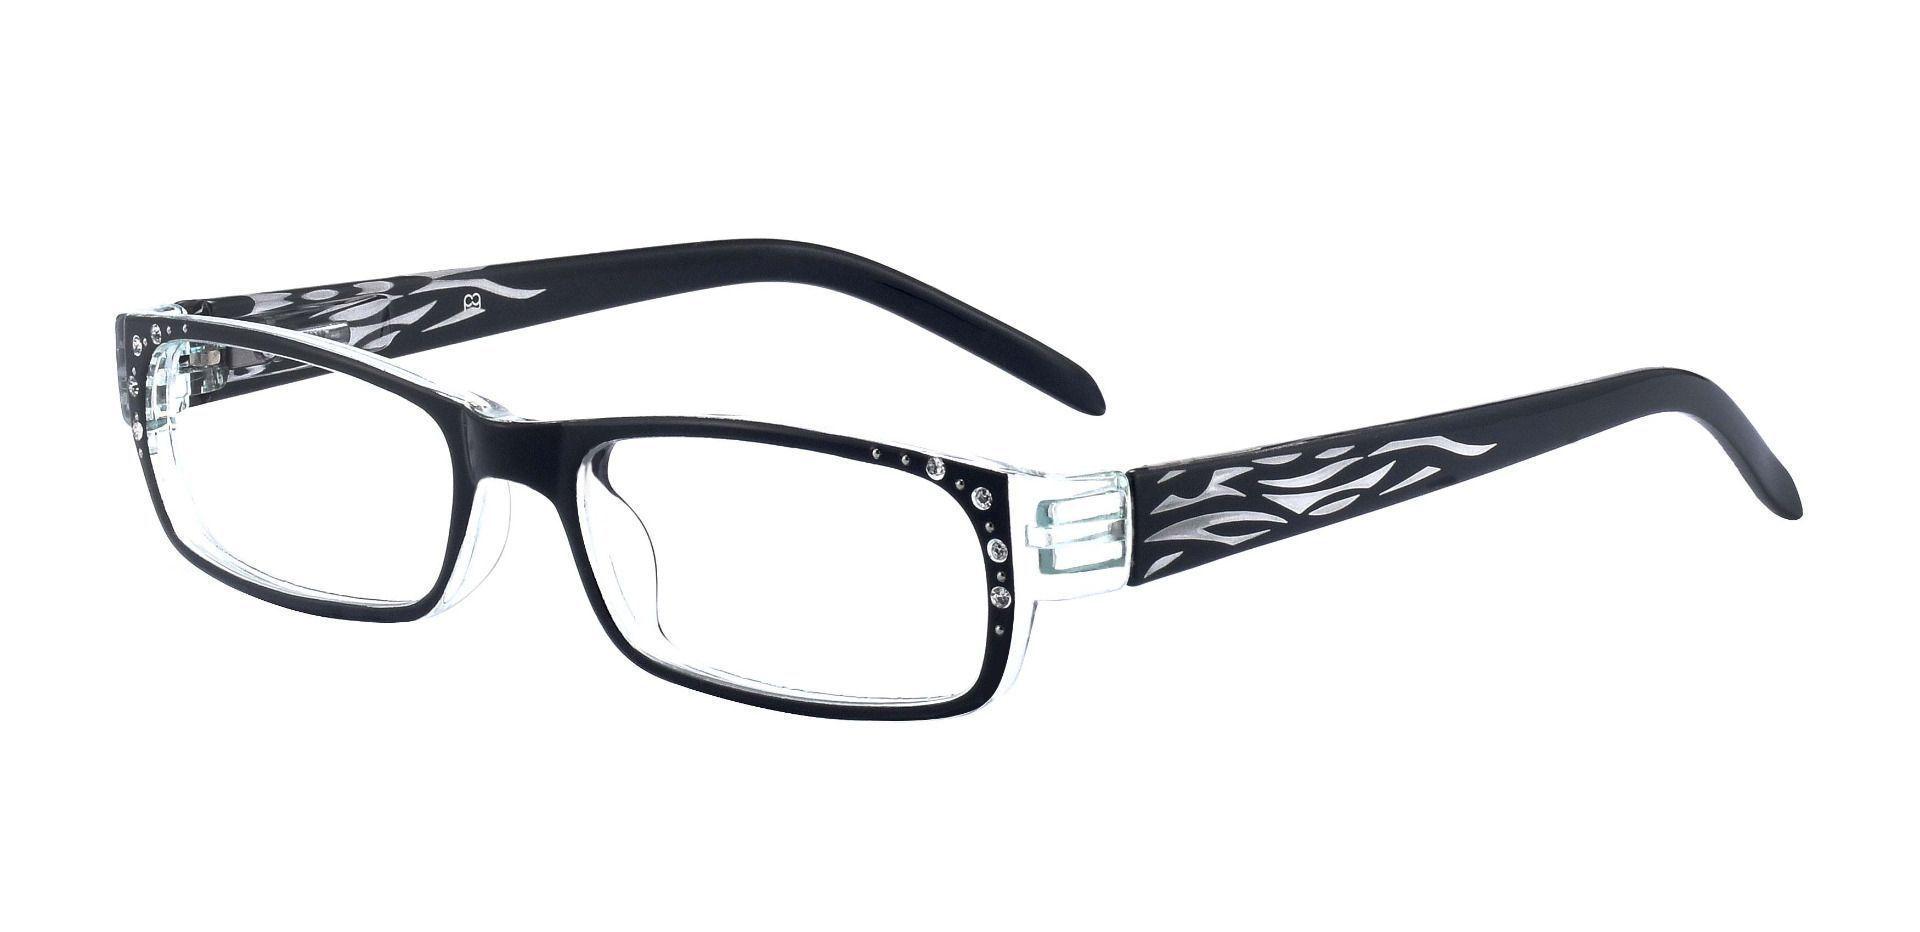 Diva Rectangle Single Vision Glasses - Black With Gems